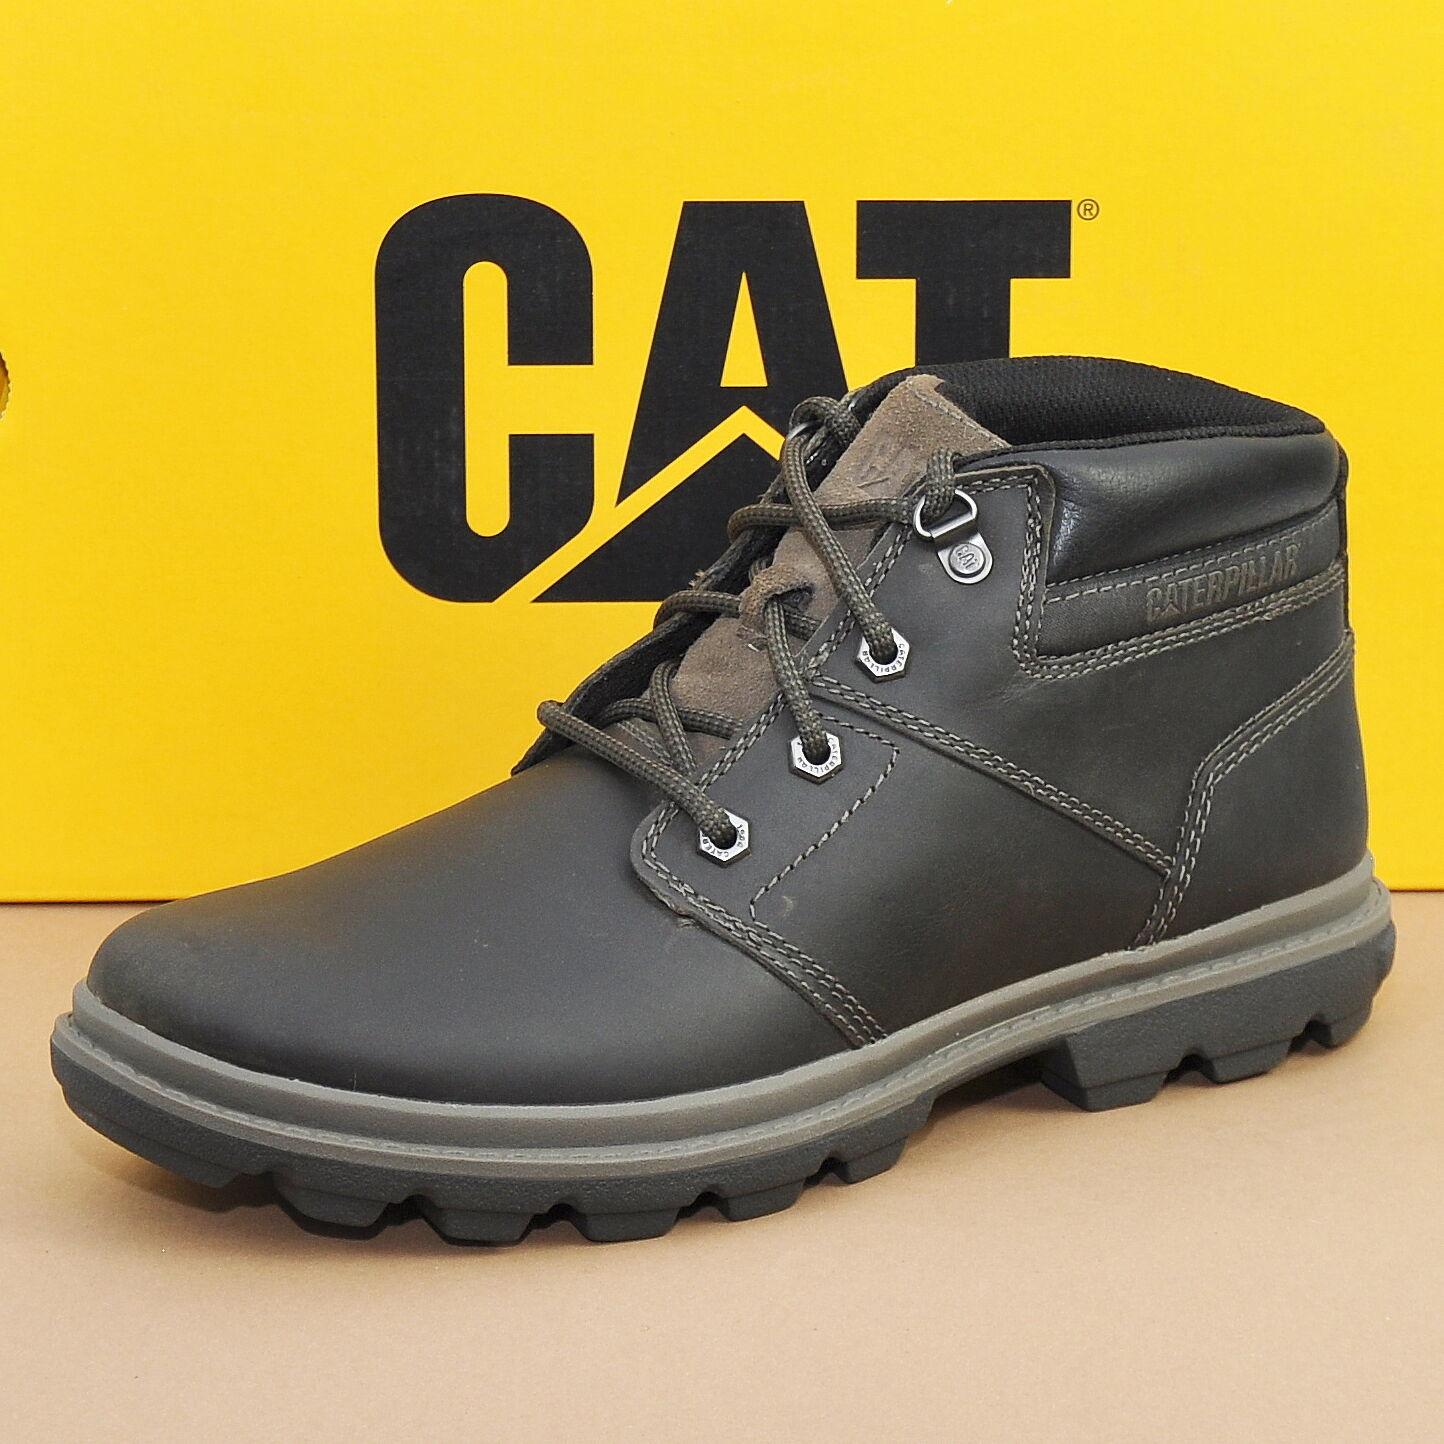 Caterpillar CAT Footwear Mowry Herren Boots Leder Schuhe Stiefel Muddy P716363